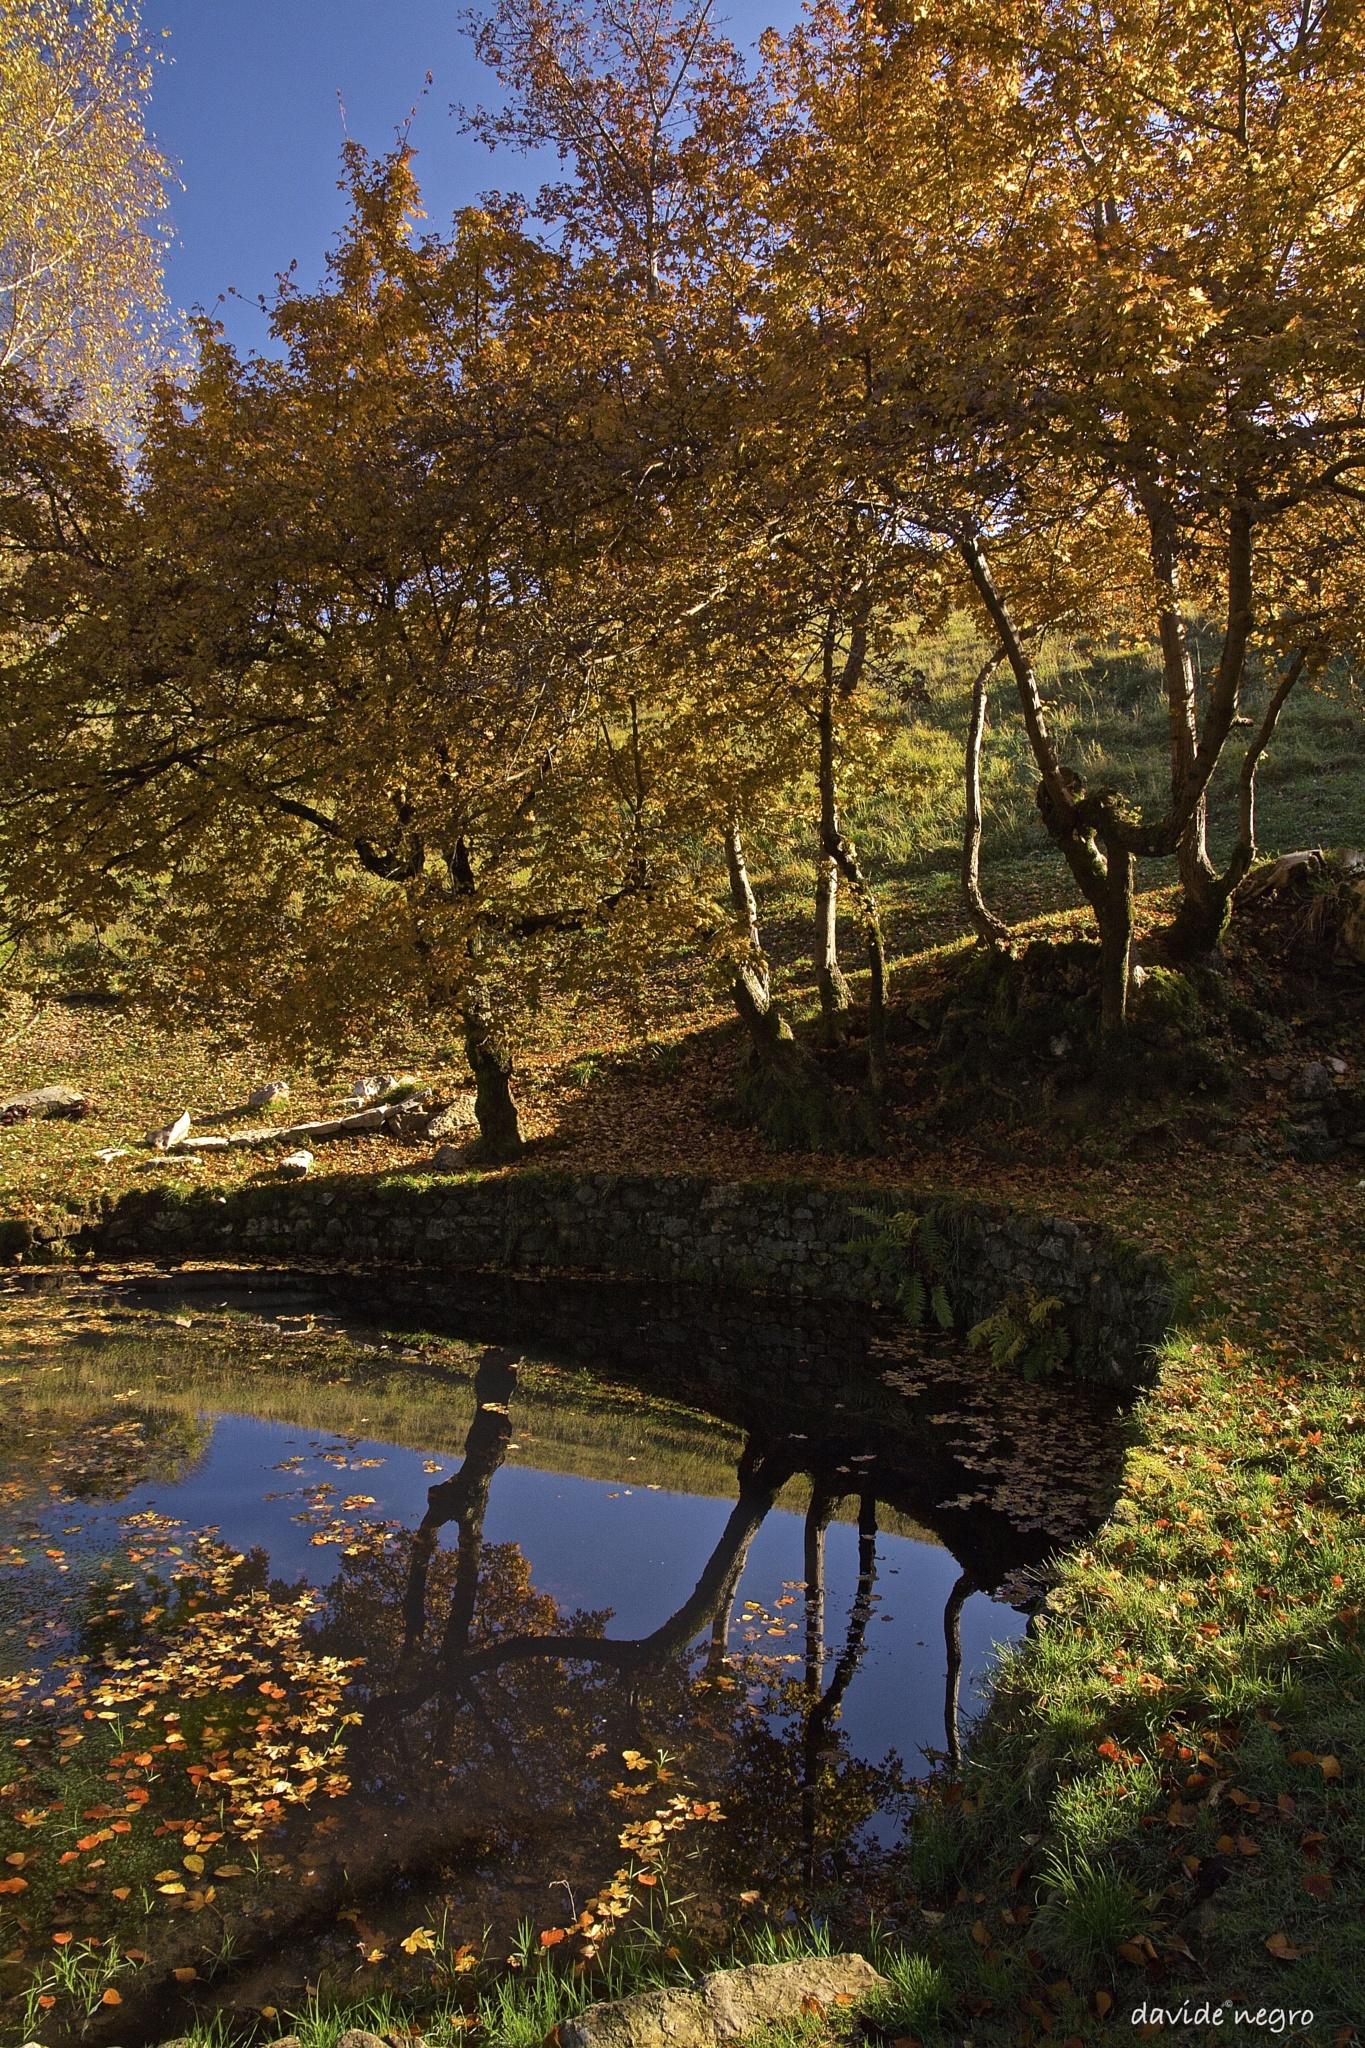 autunno by DavideNegro